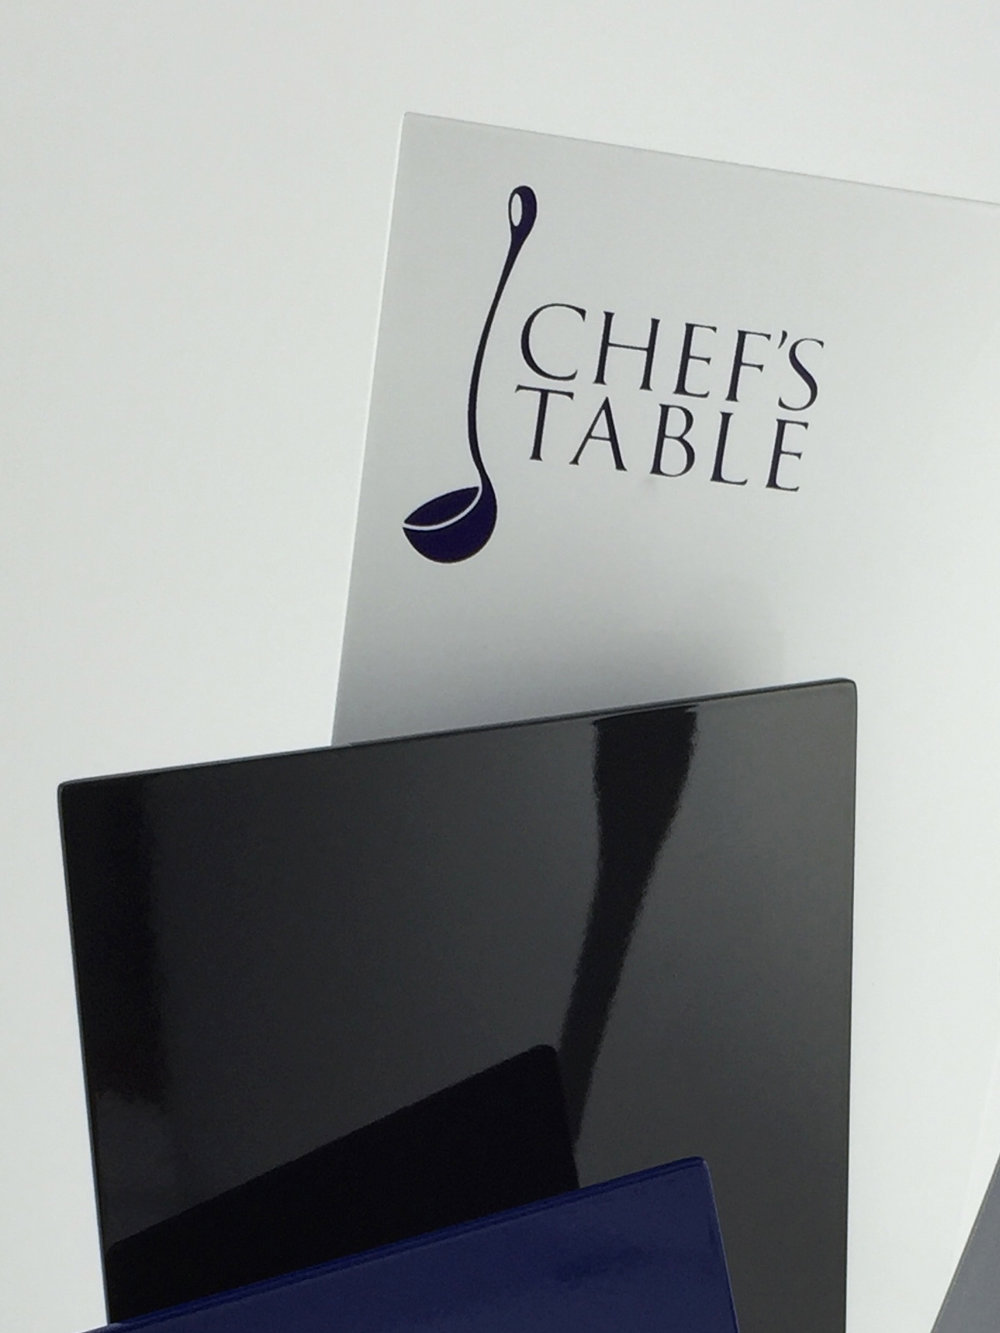 Chefs-table-aluminium-trohpy-award-01.jpg